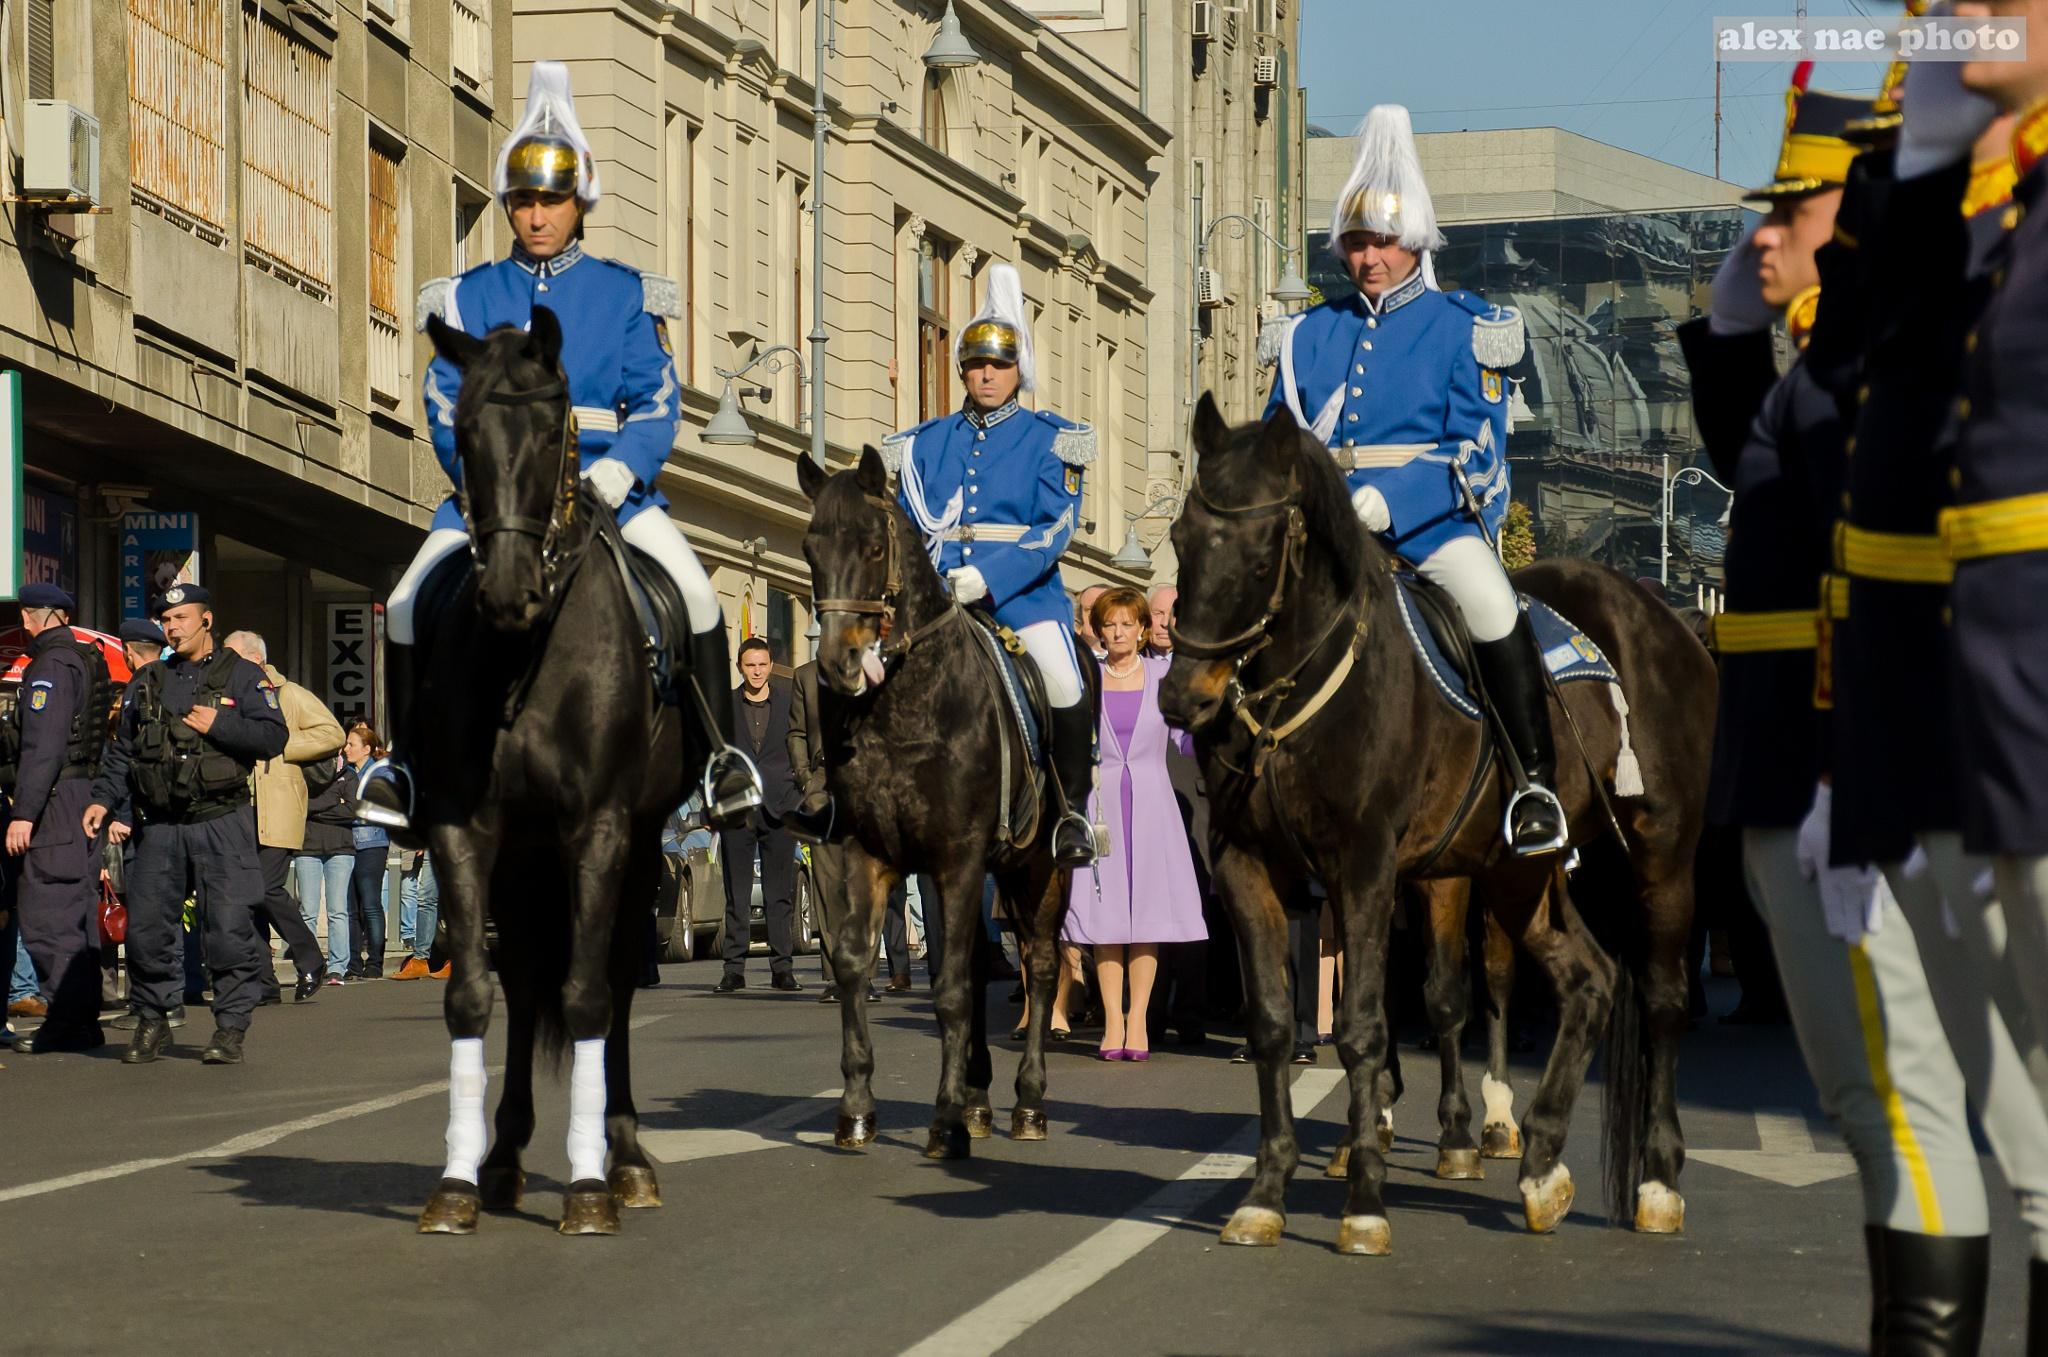 Royal Parade - I by alexandru nae